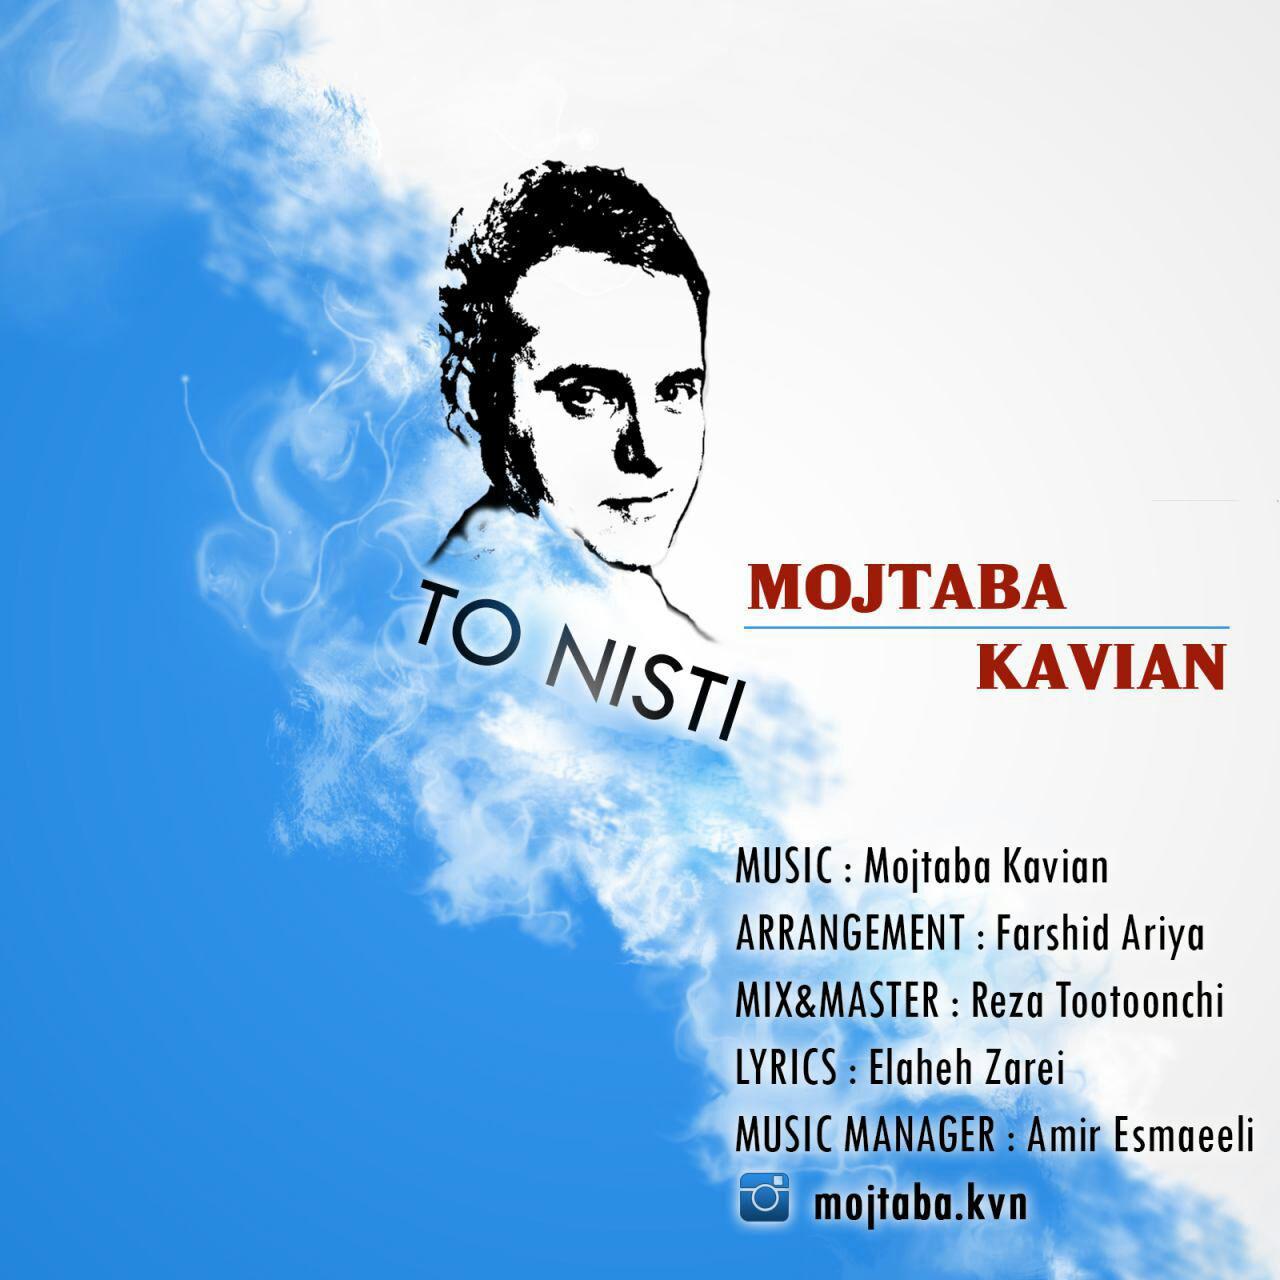 Mojtaba-Kavian_To-Nisti